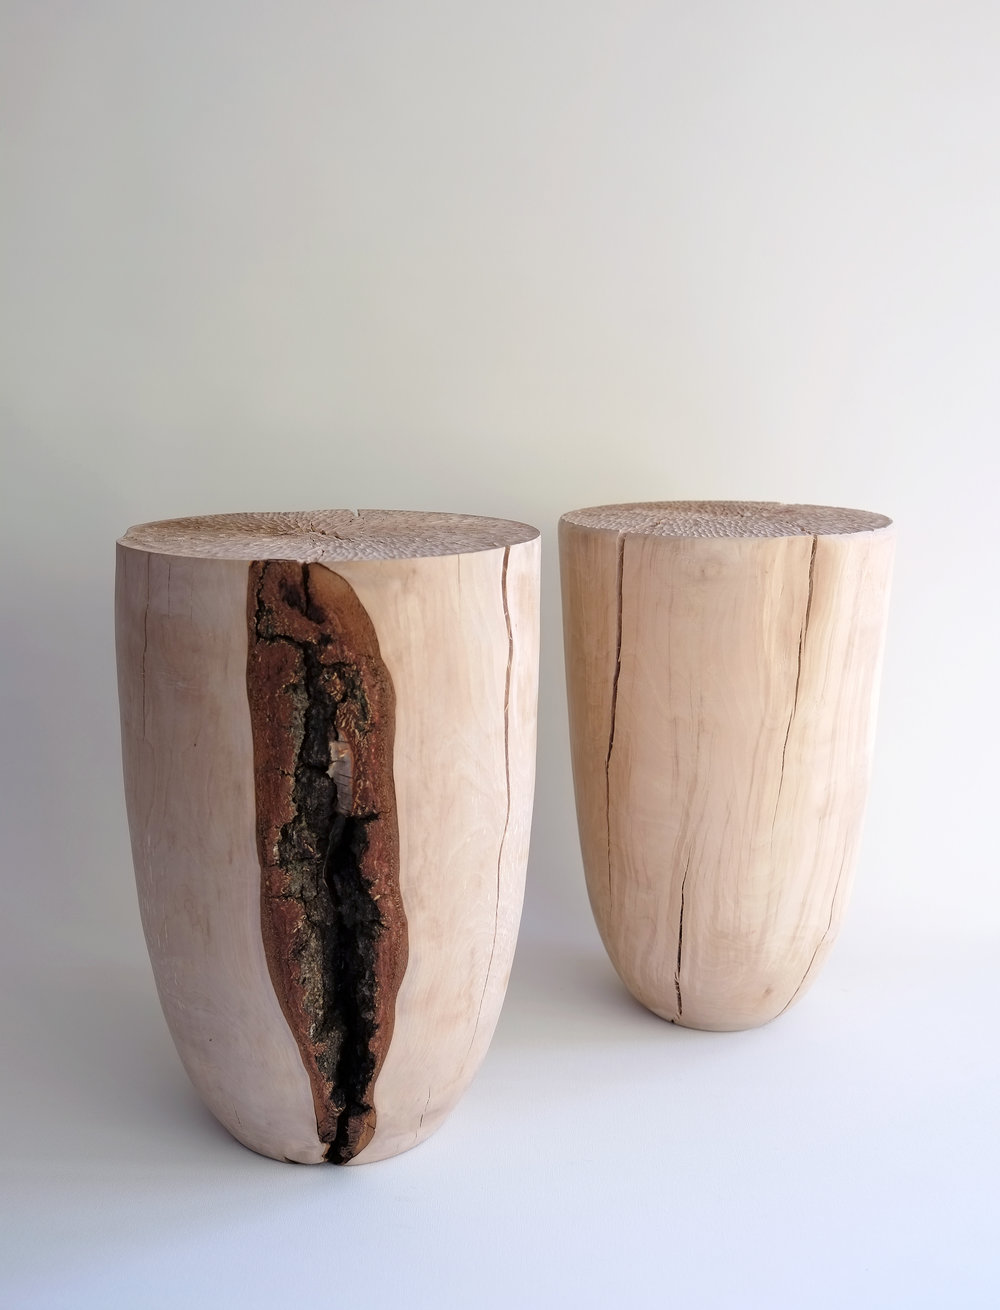 Split Birch Stools 2016 / silver birch